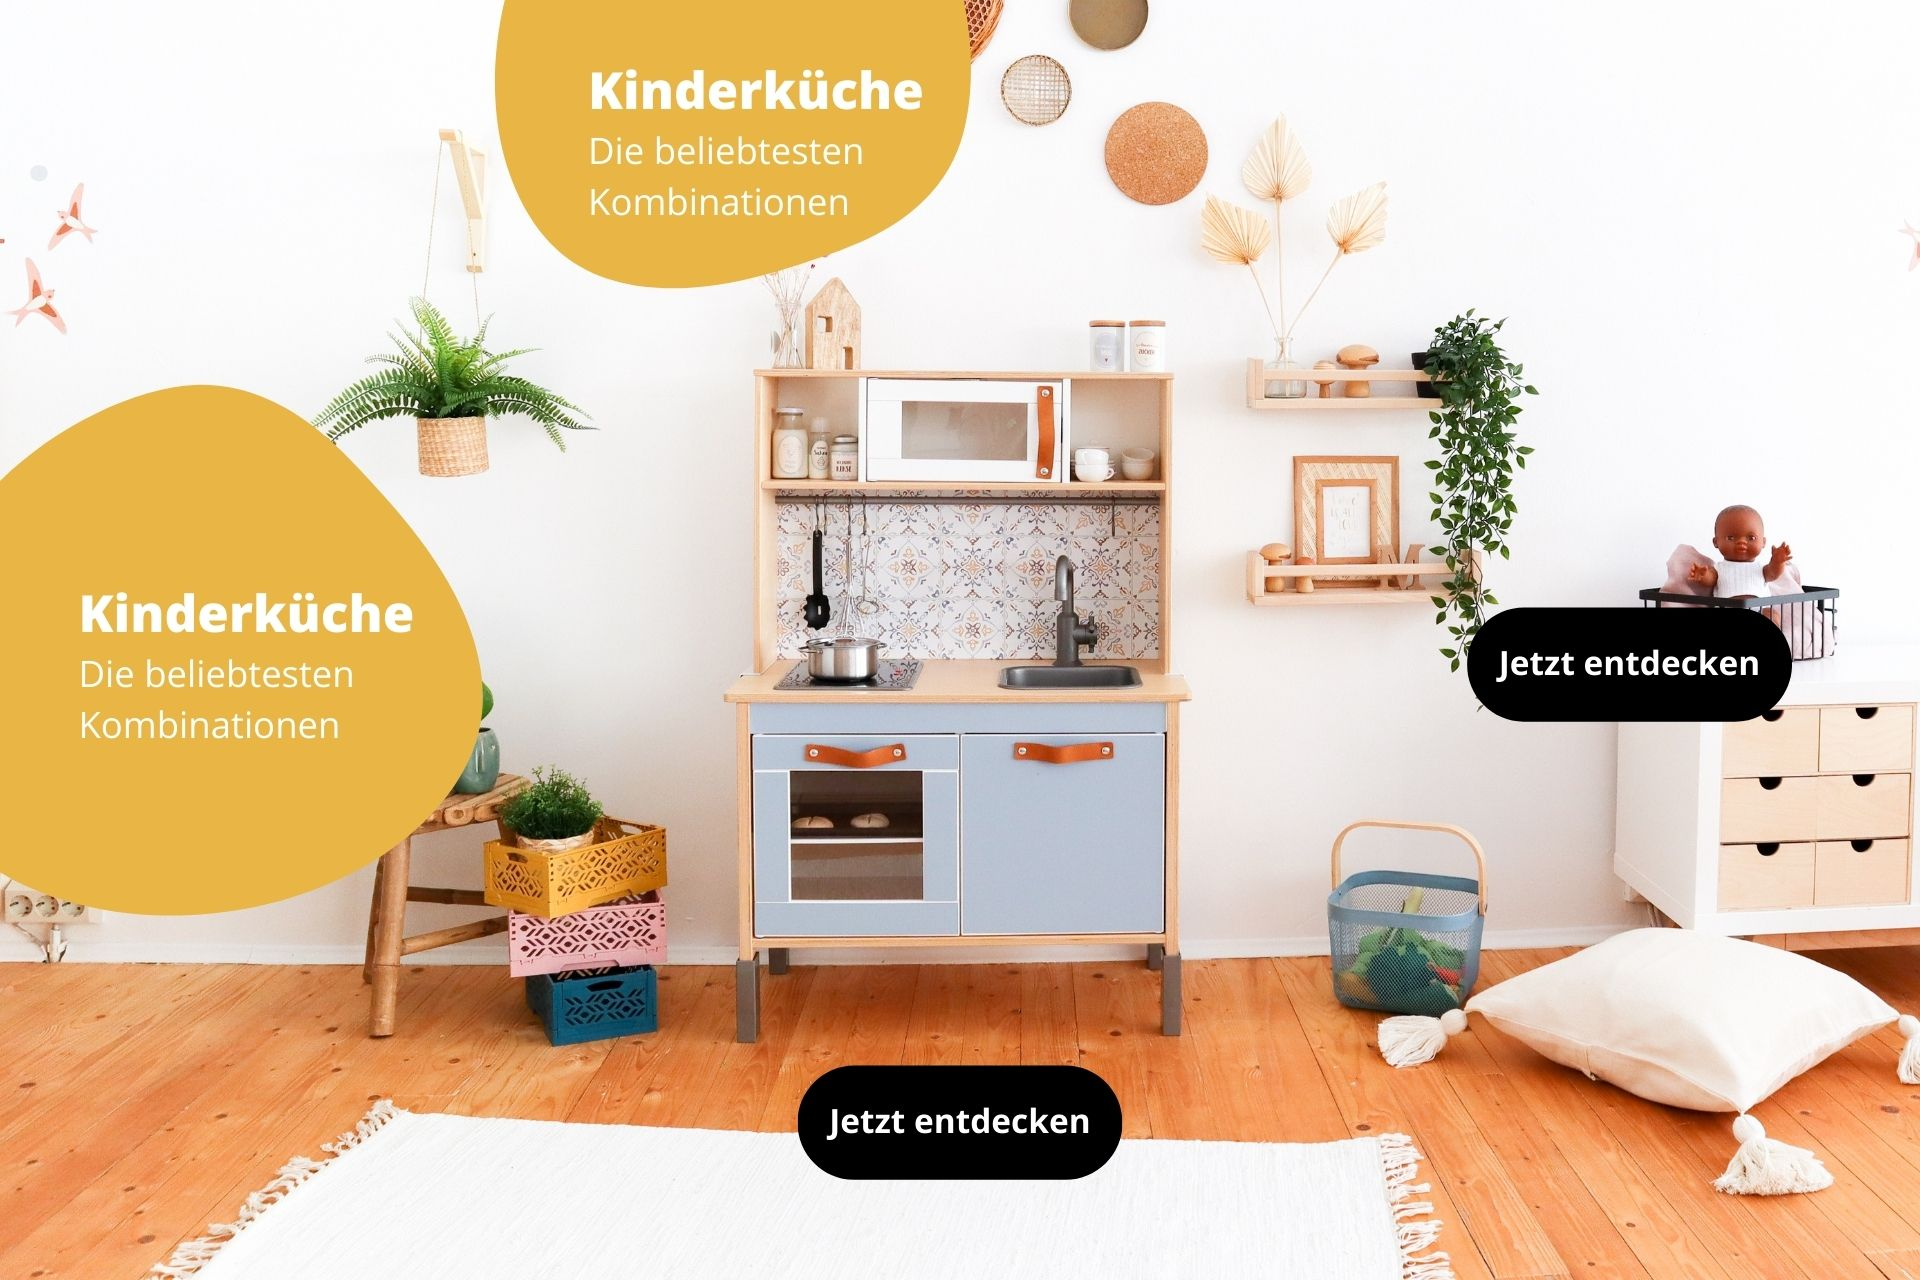 Kinderküche Kombi